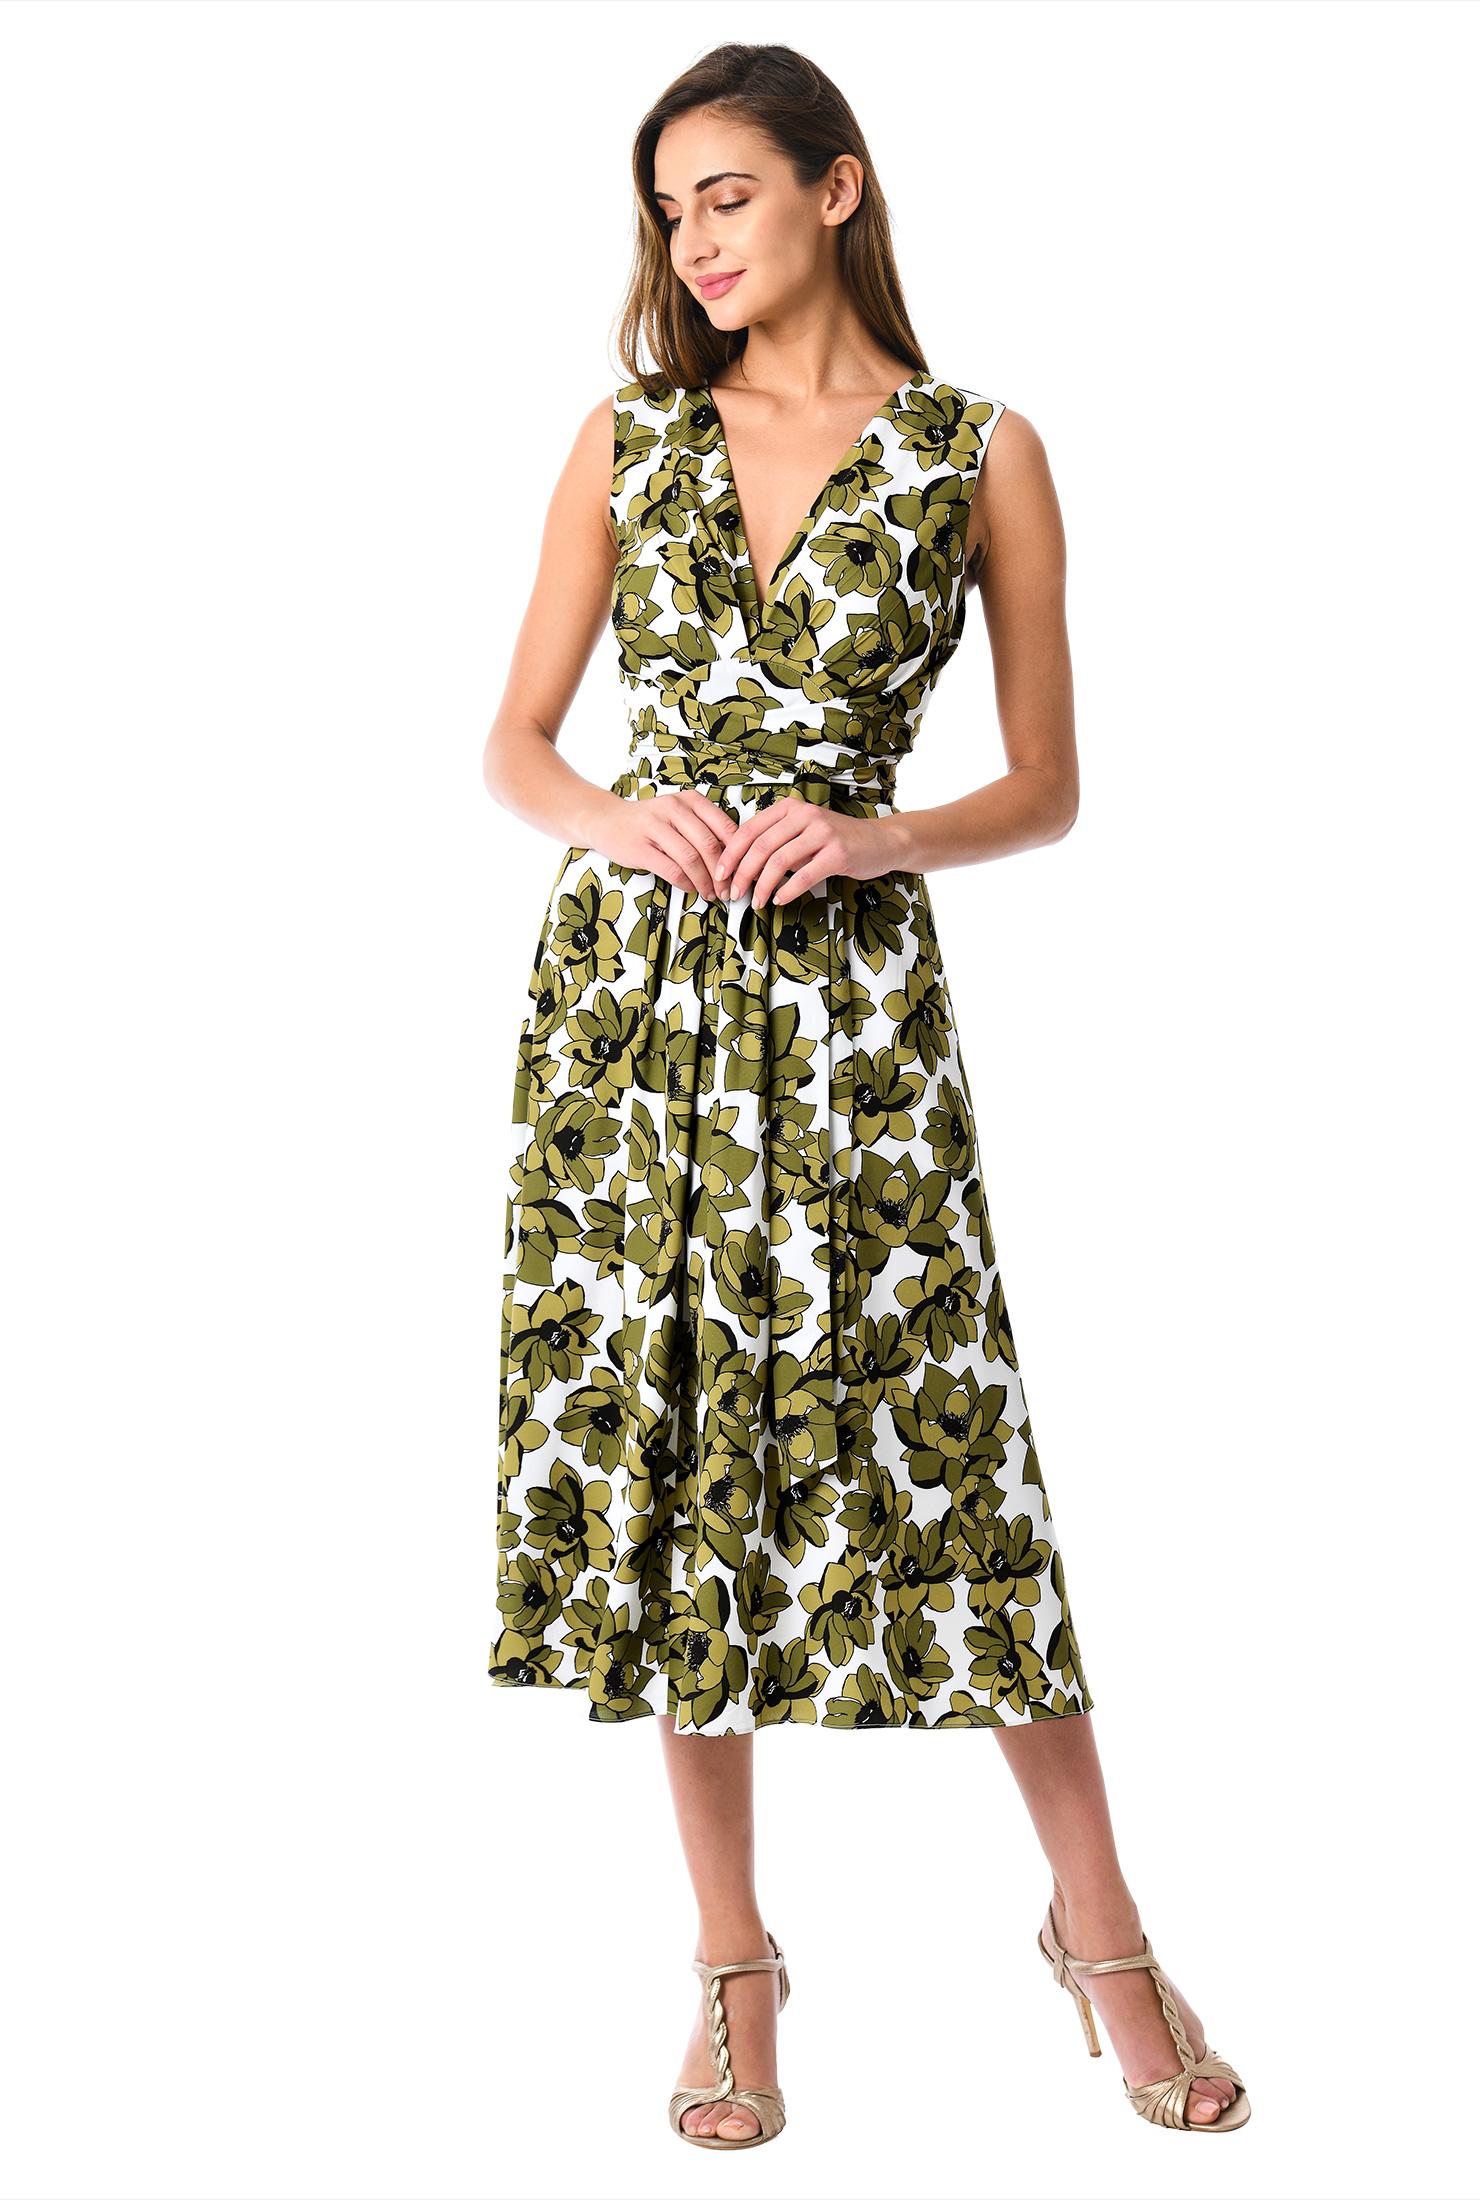 4f312d509ef Women s Fashion Clothing 0-36W and Custom